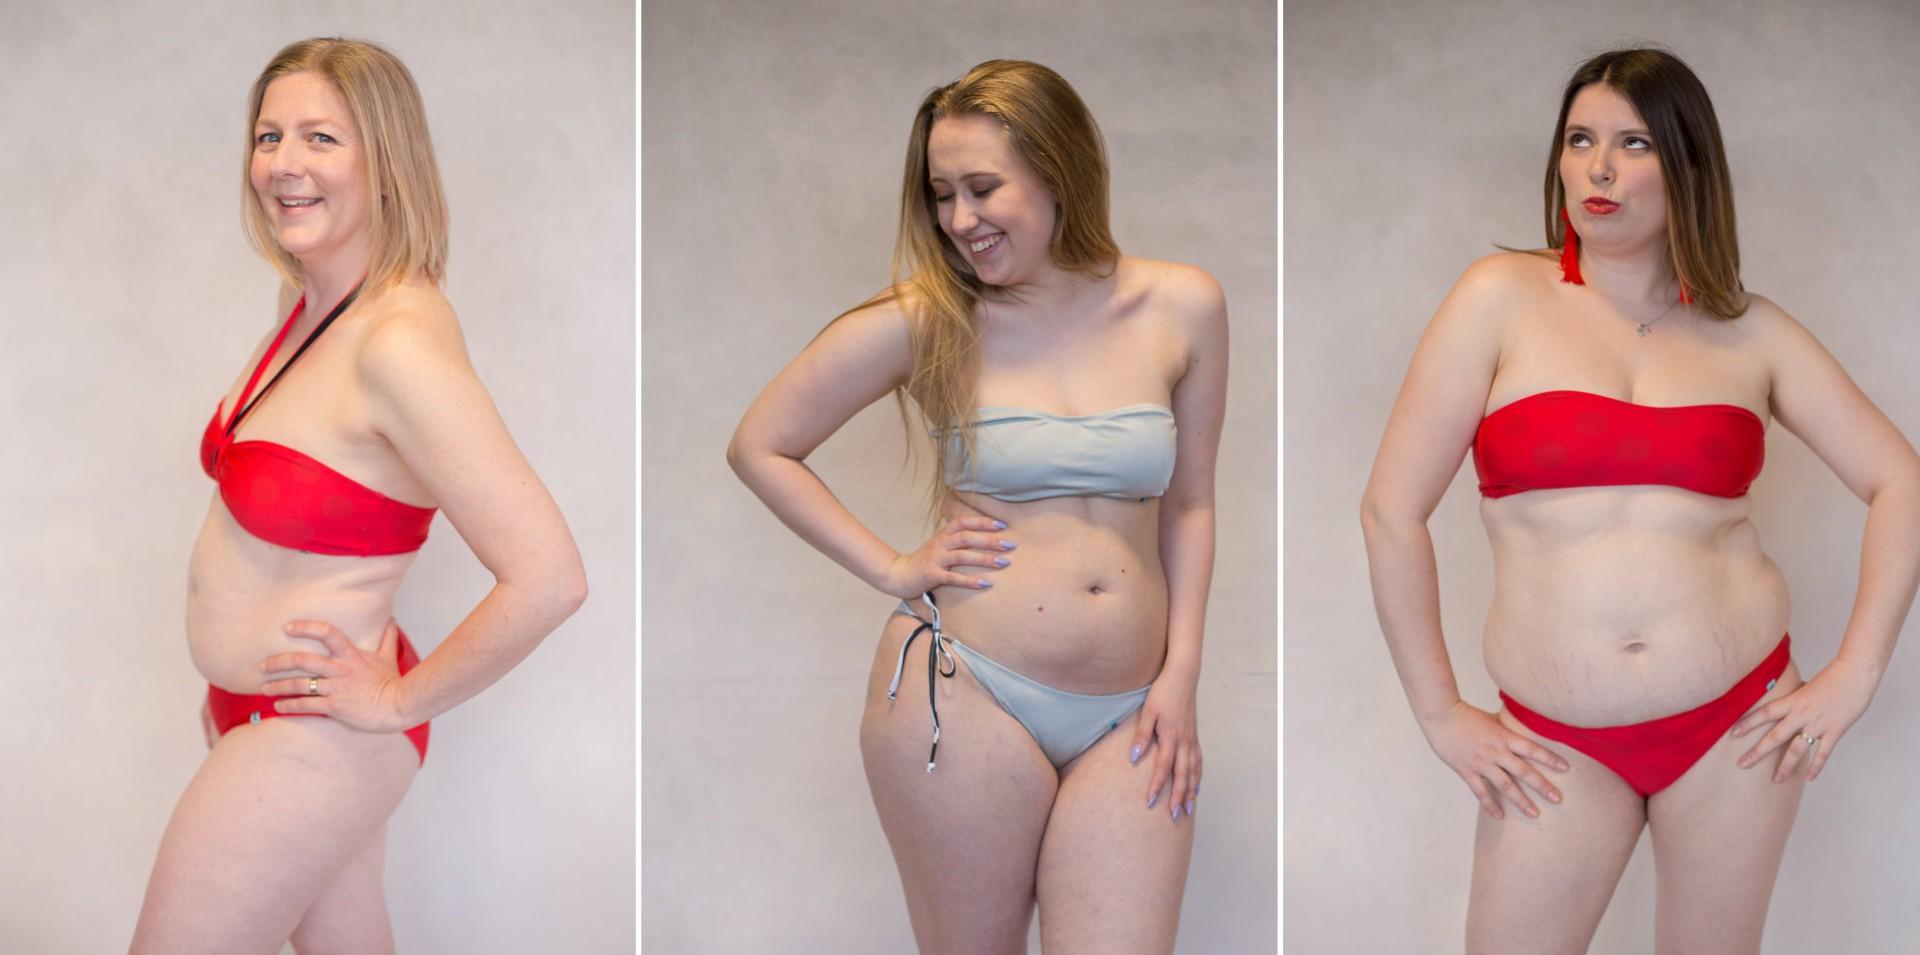 body positive bikini photoshoot by Viktoria Kuti Photography, Bristol